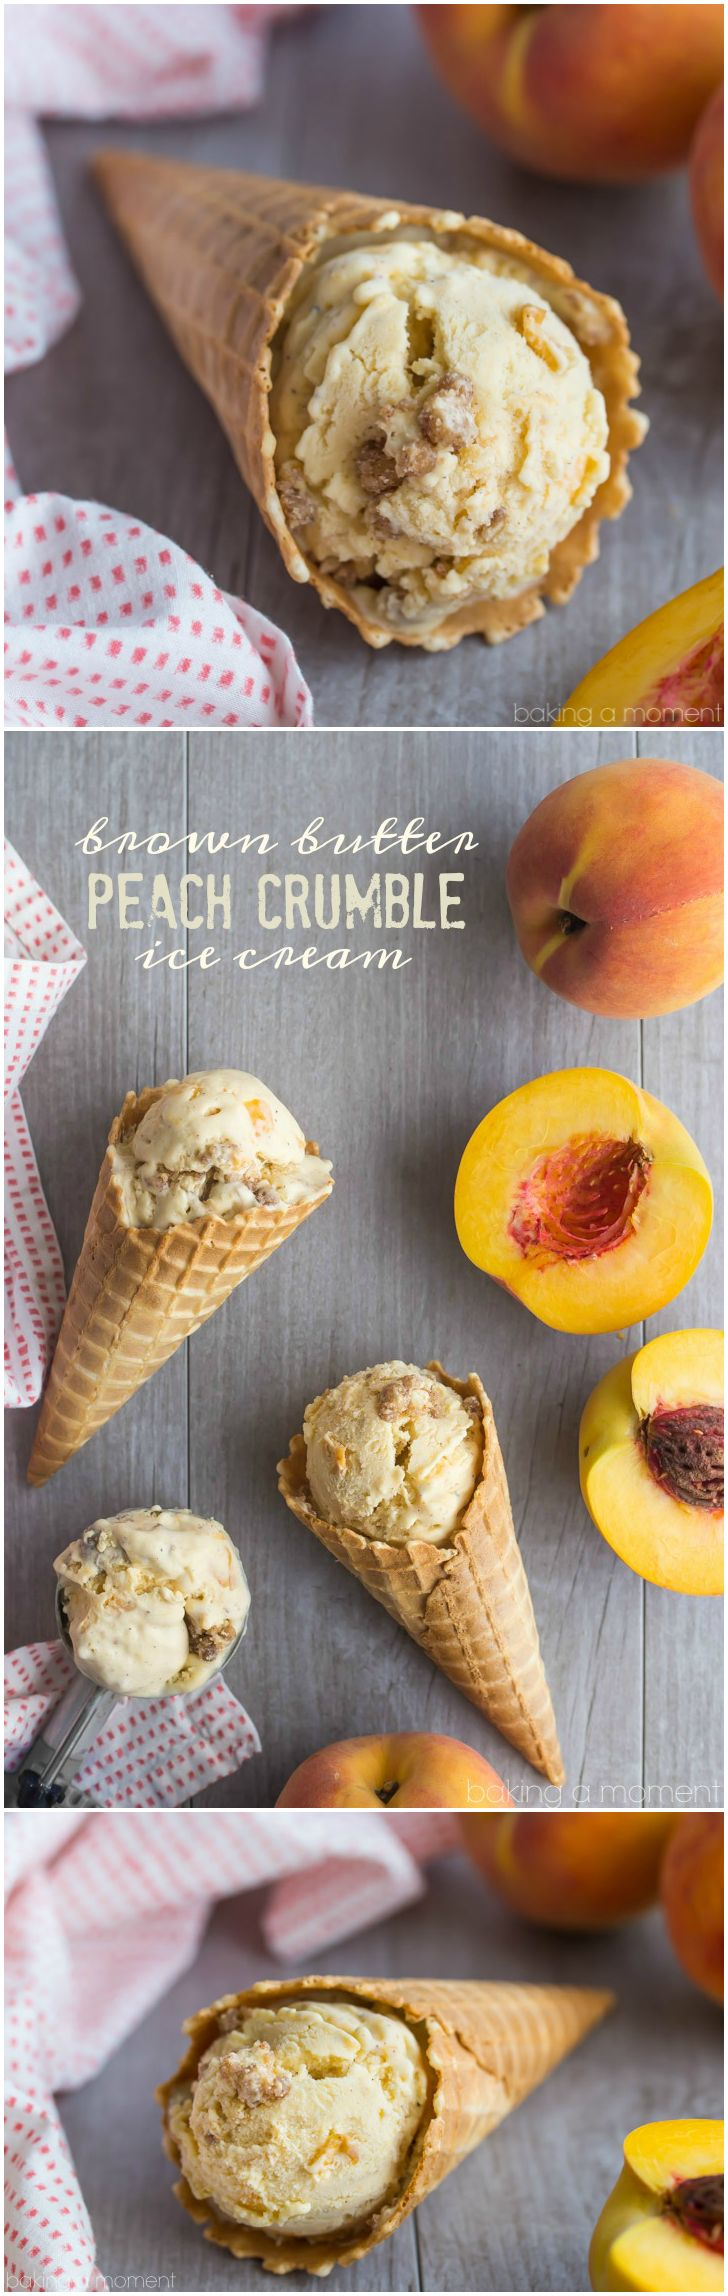 Brown Butter Peach Crumble Ice Cream- the ice cream has brown butter and peaches and there's the most delicious cinnamon streusel swirl!